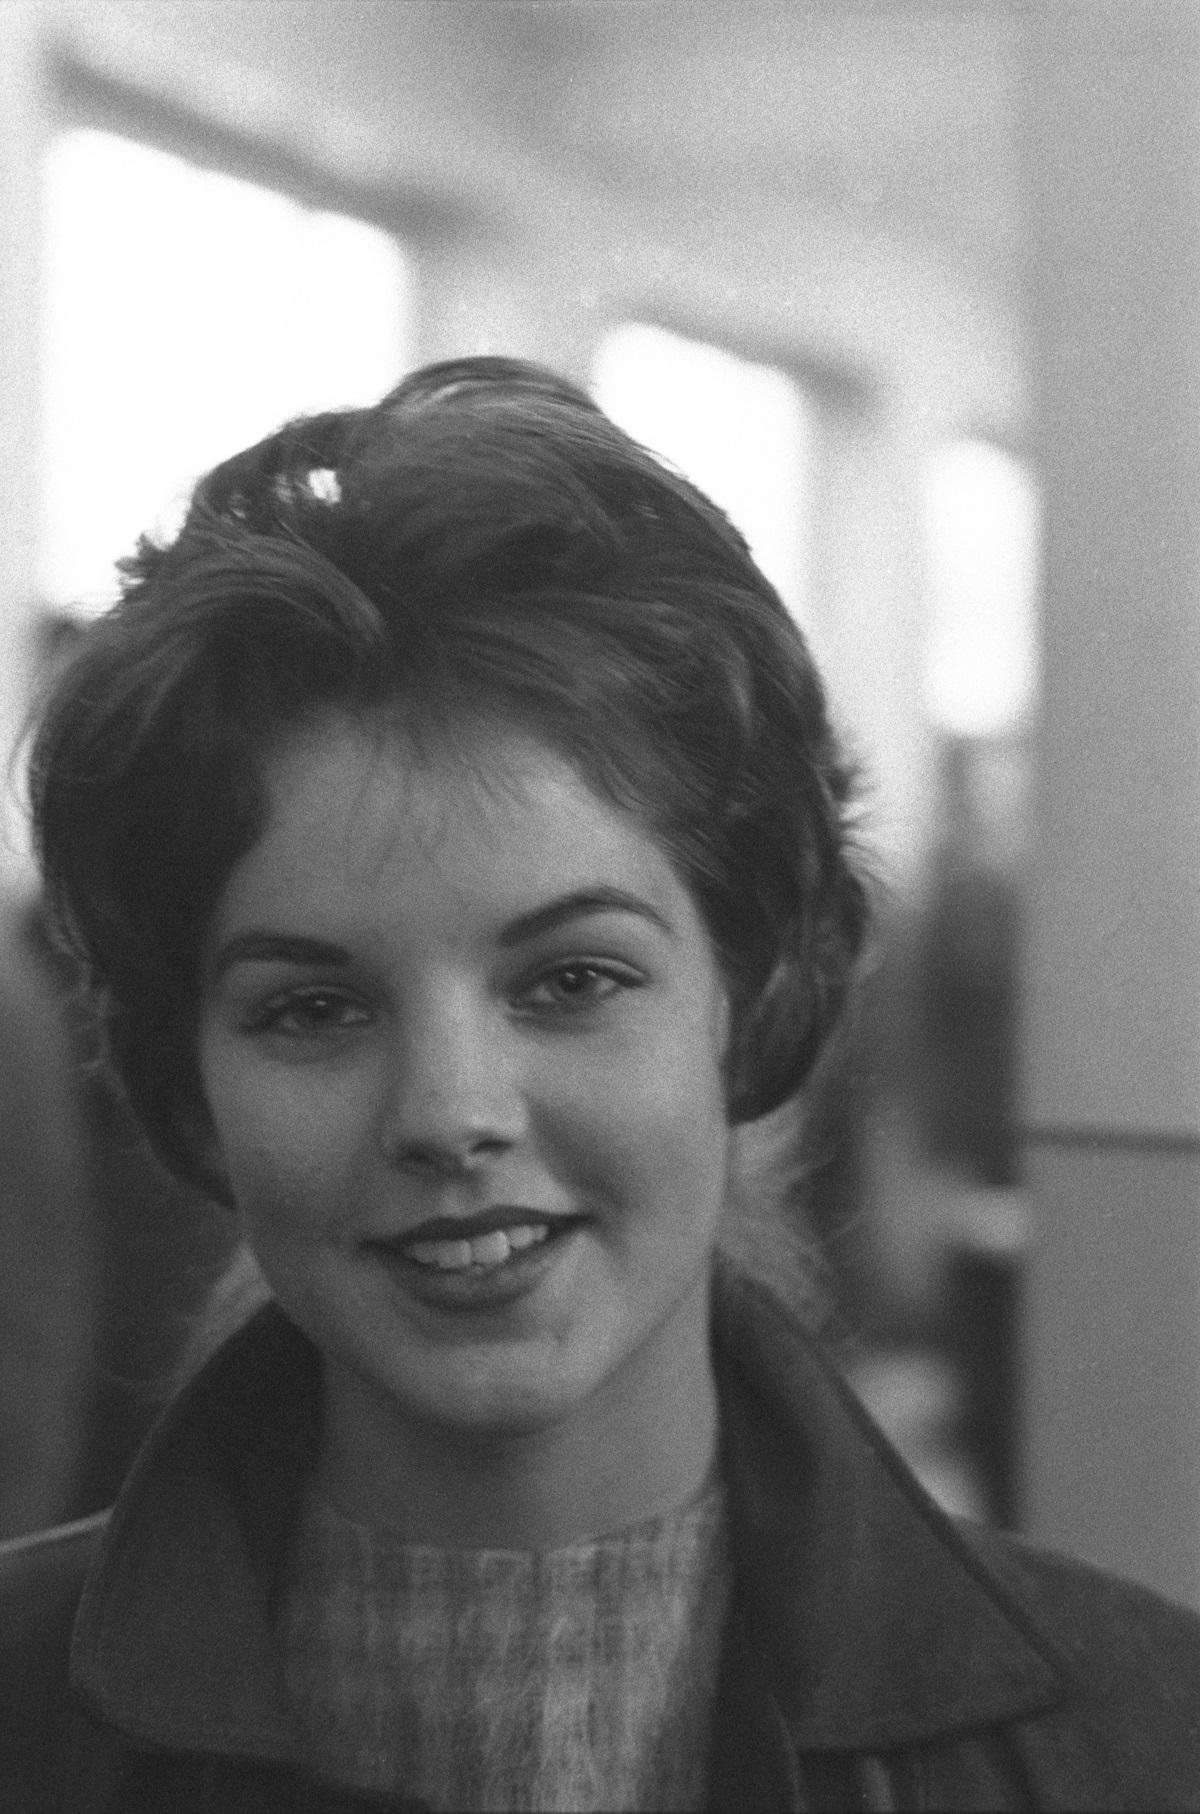 Priscilla Beaulieu